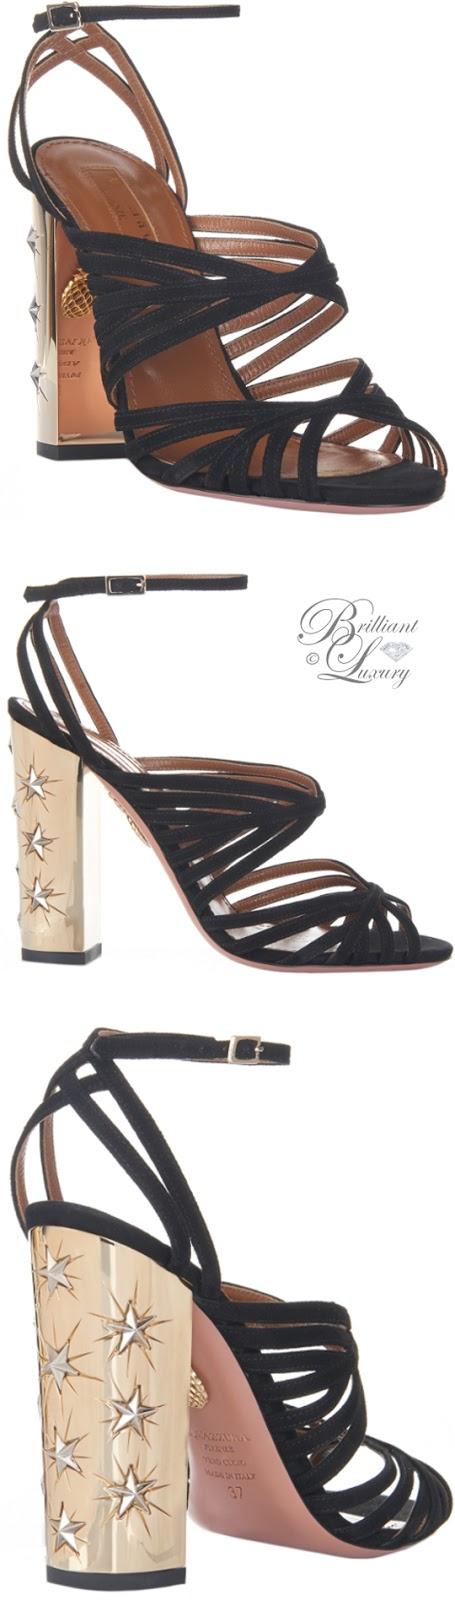 Brilliant Luxury ♦ Aquazzura Trinitiy Sandals